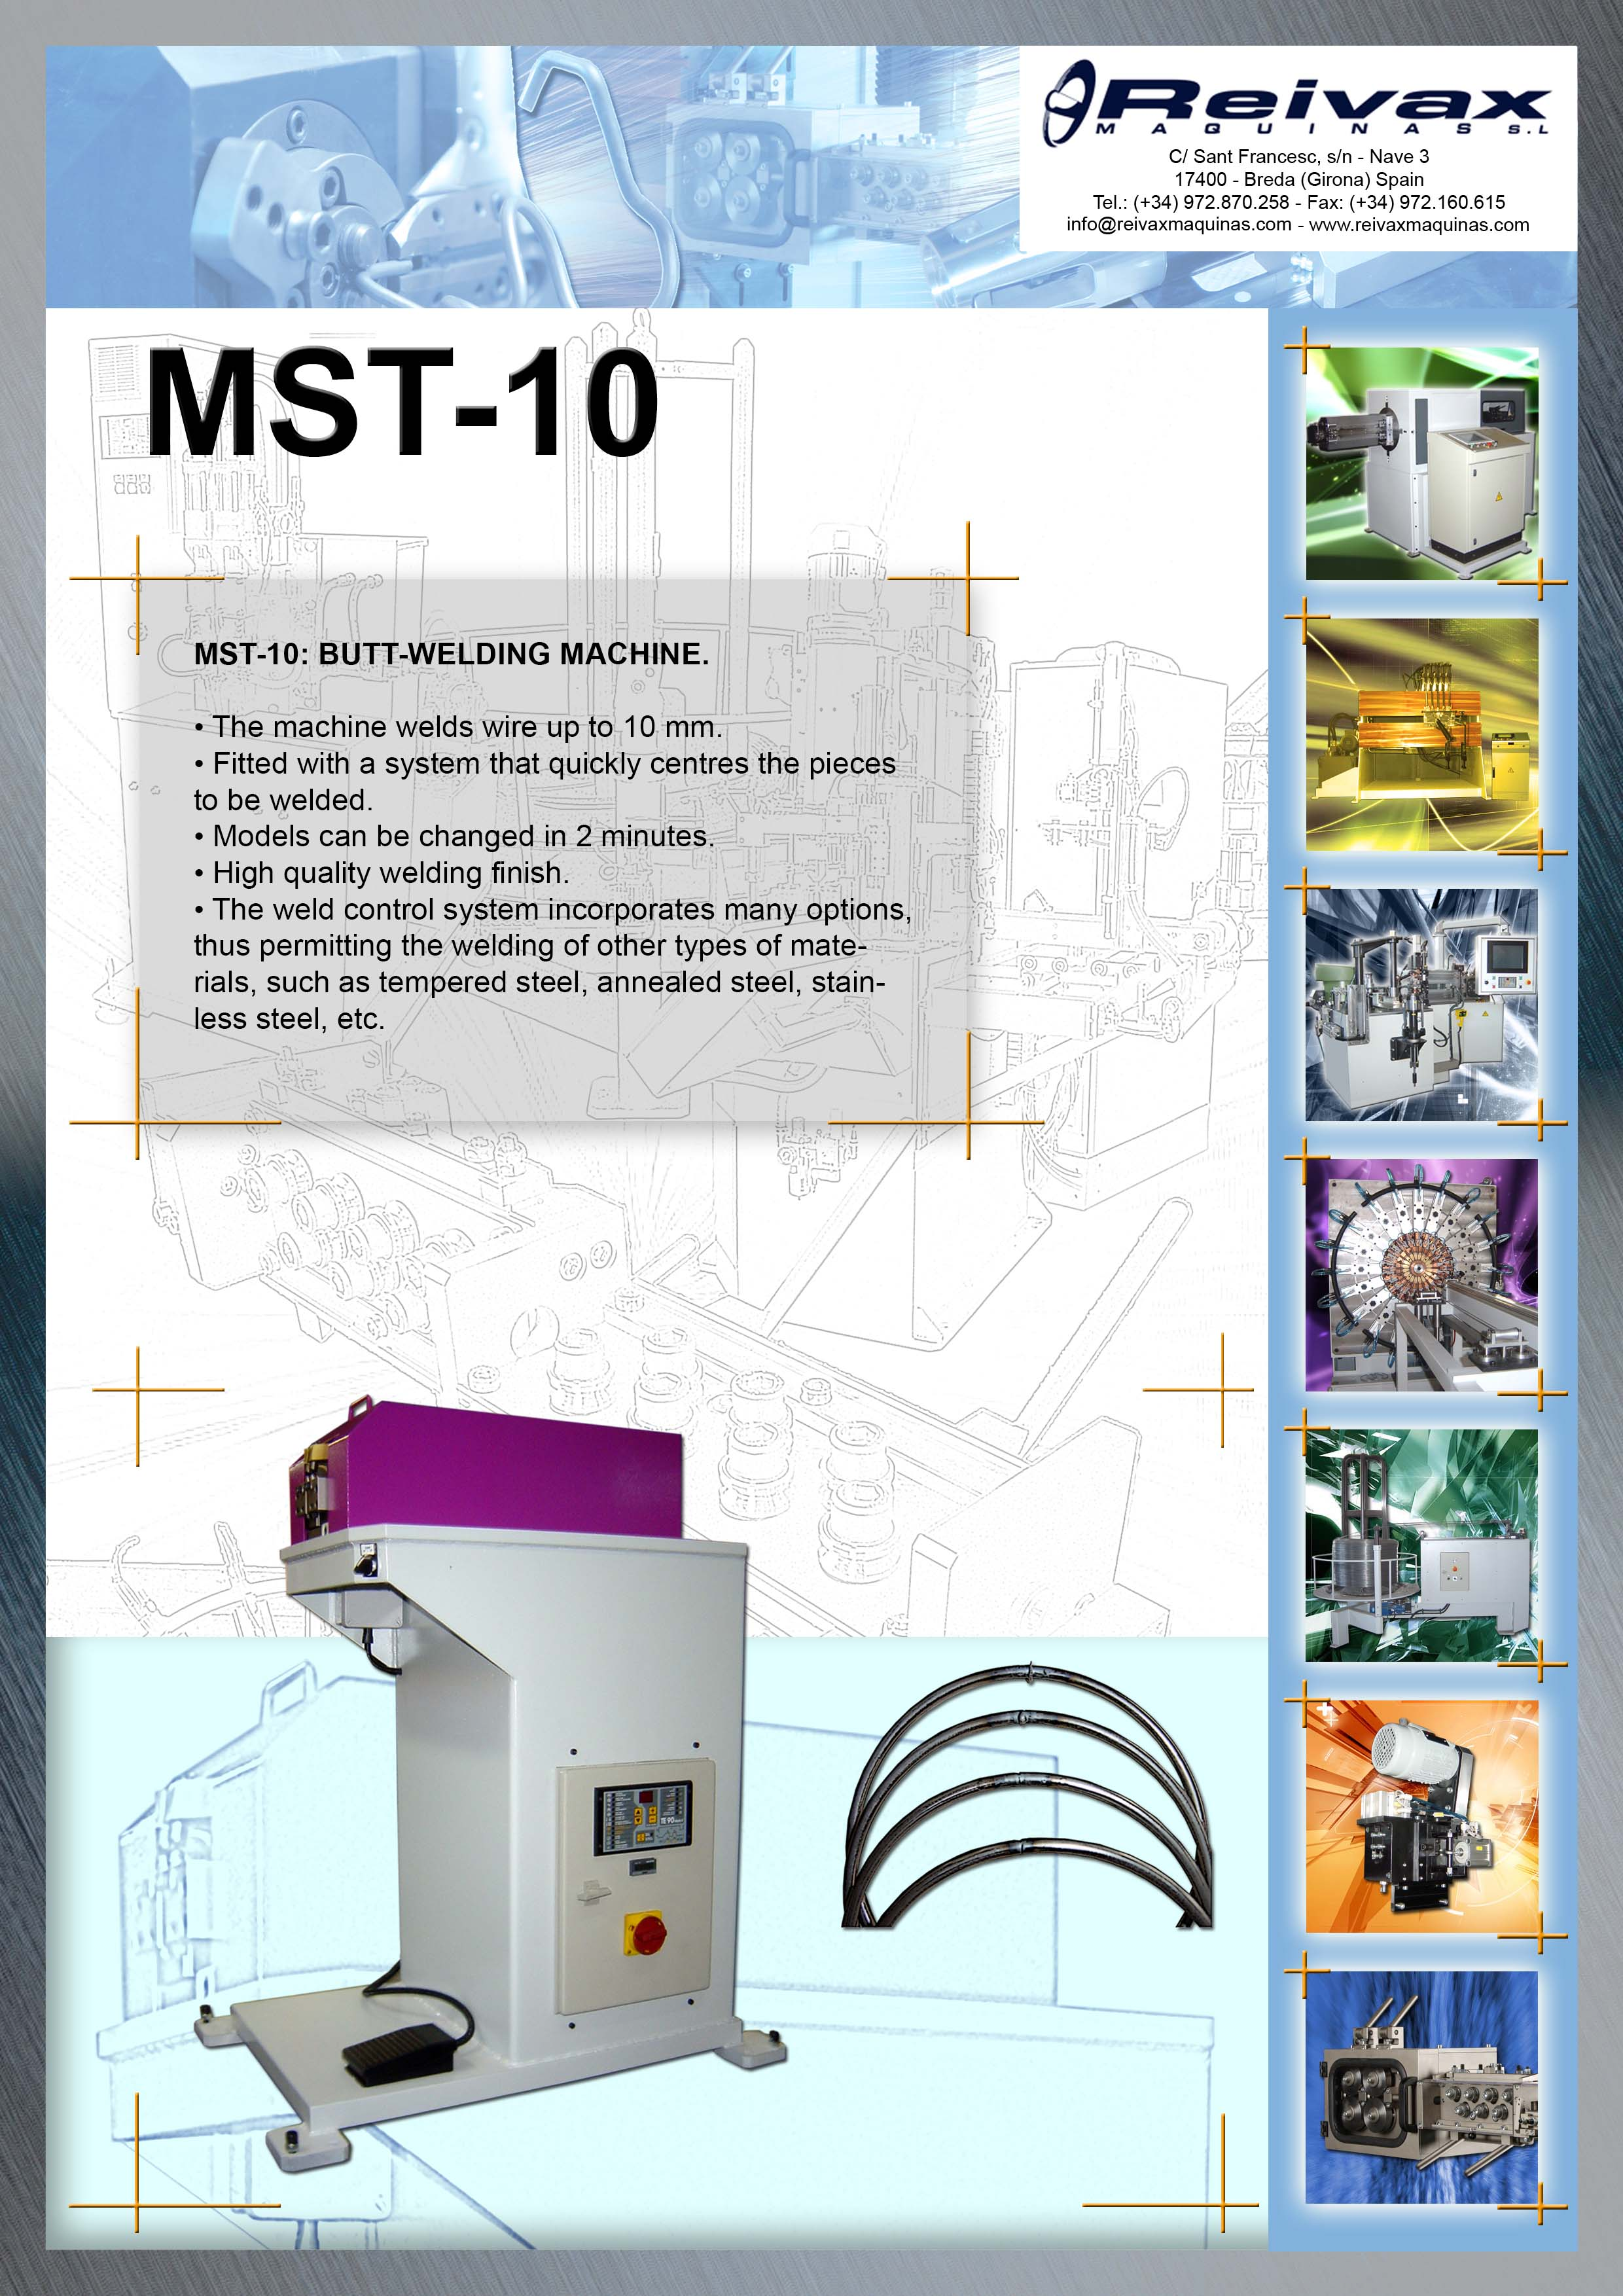 ReivaxMaquinas: Technical Data MST-10